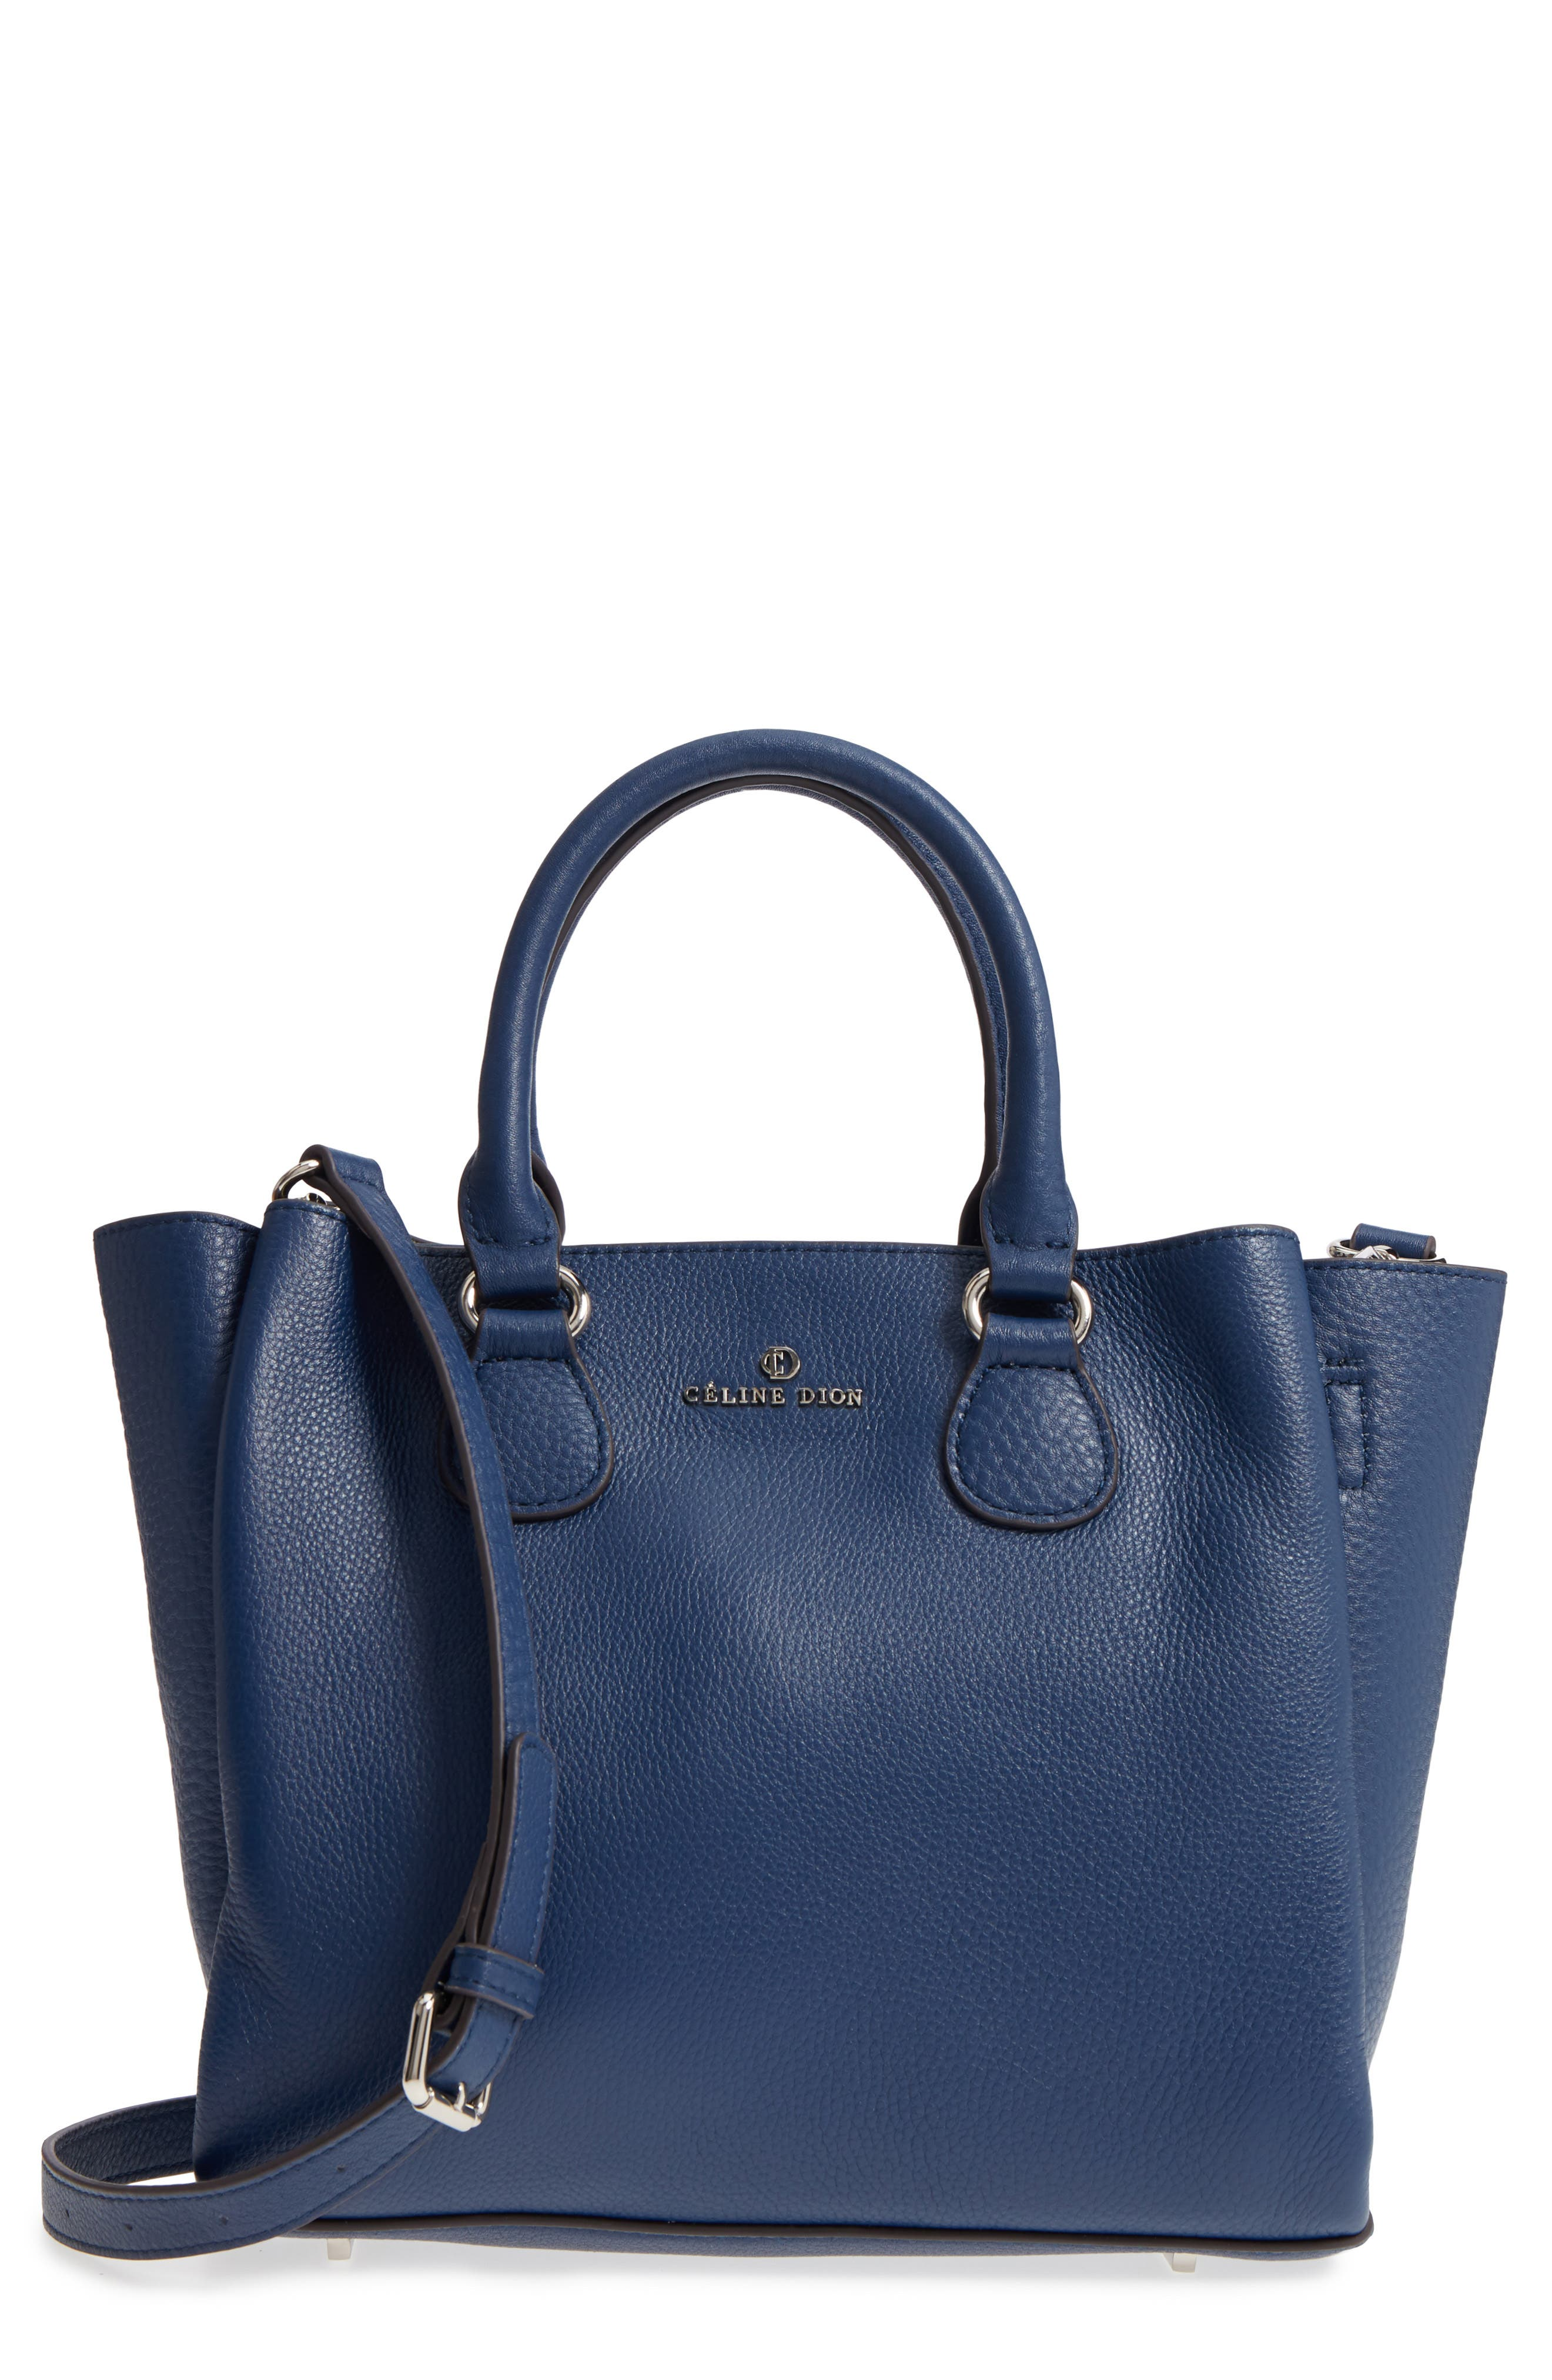 Céline Dion Small Adagio Leather Satchel,                             Main thumbnail 4, color,